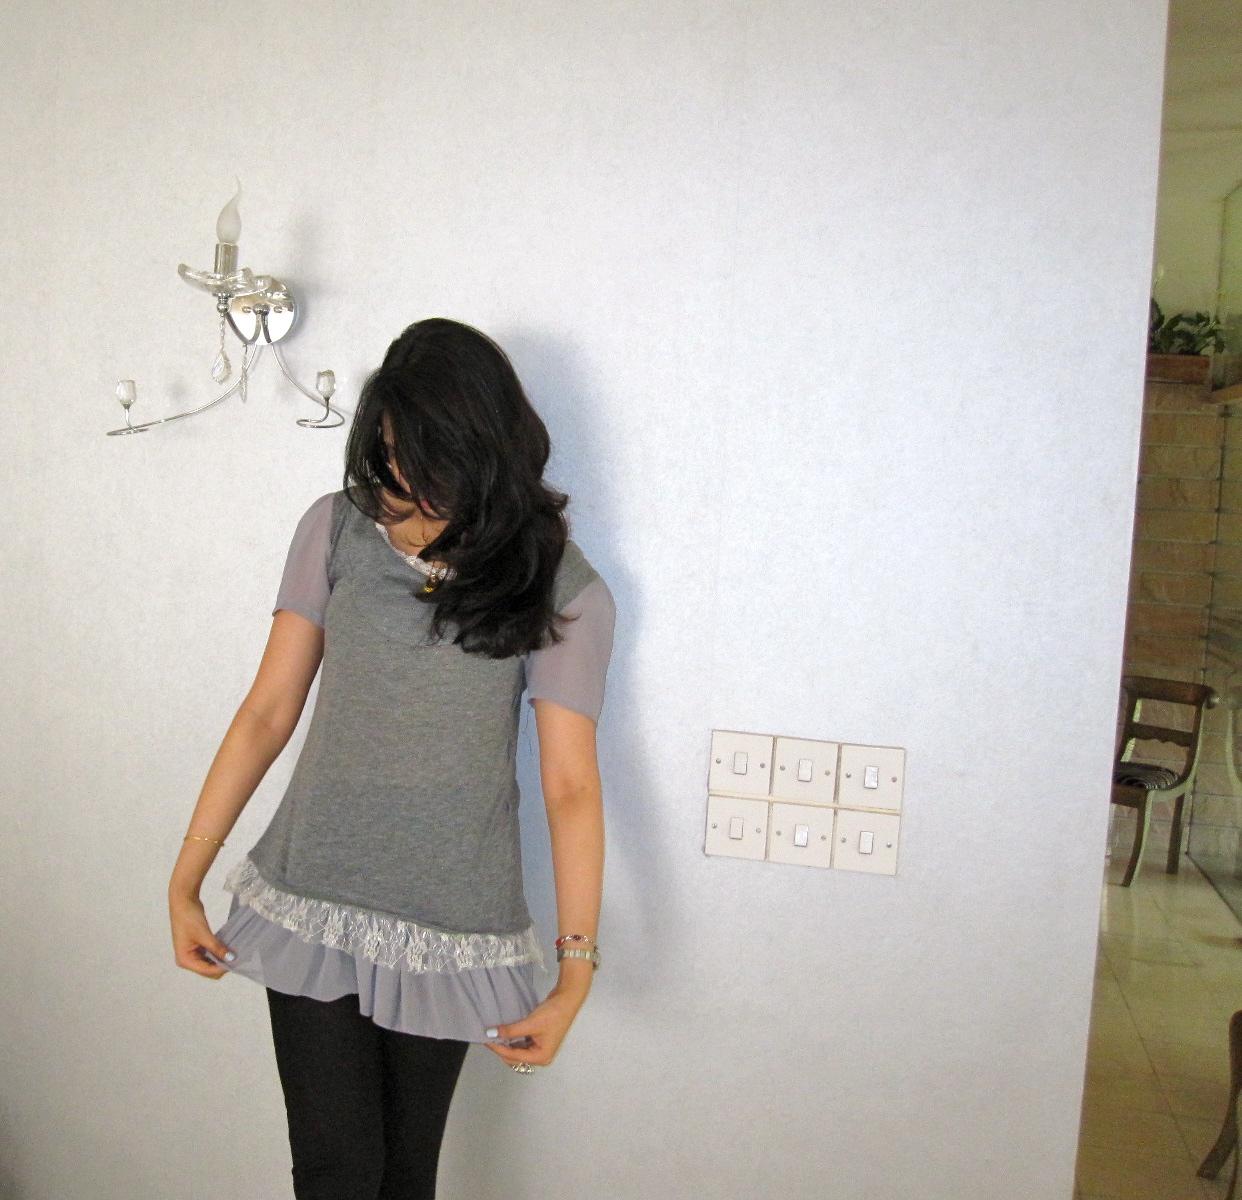 http://1.bp.blogspot.com/_hbMrxPpDXEs/S8WpjExJBnI/AAAAAAAAE44/tht5IJ4Luzw/s1600/IMG_1017.JPG